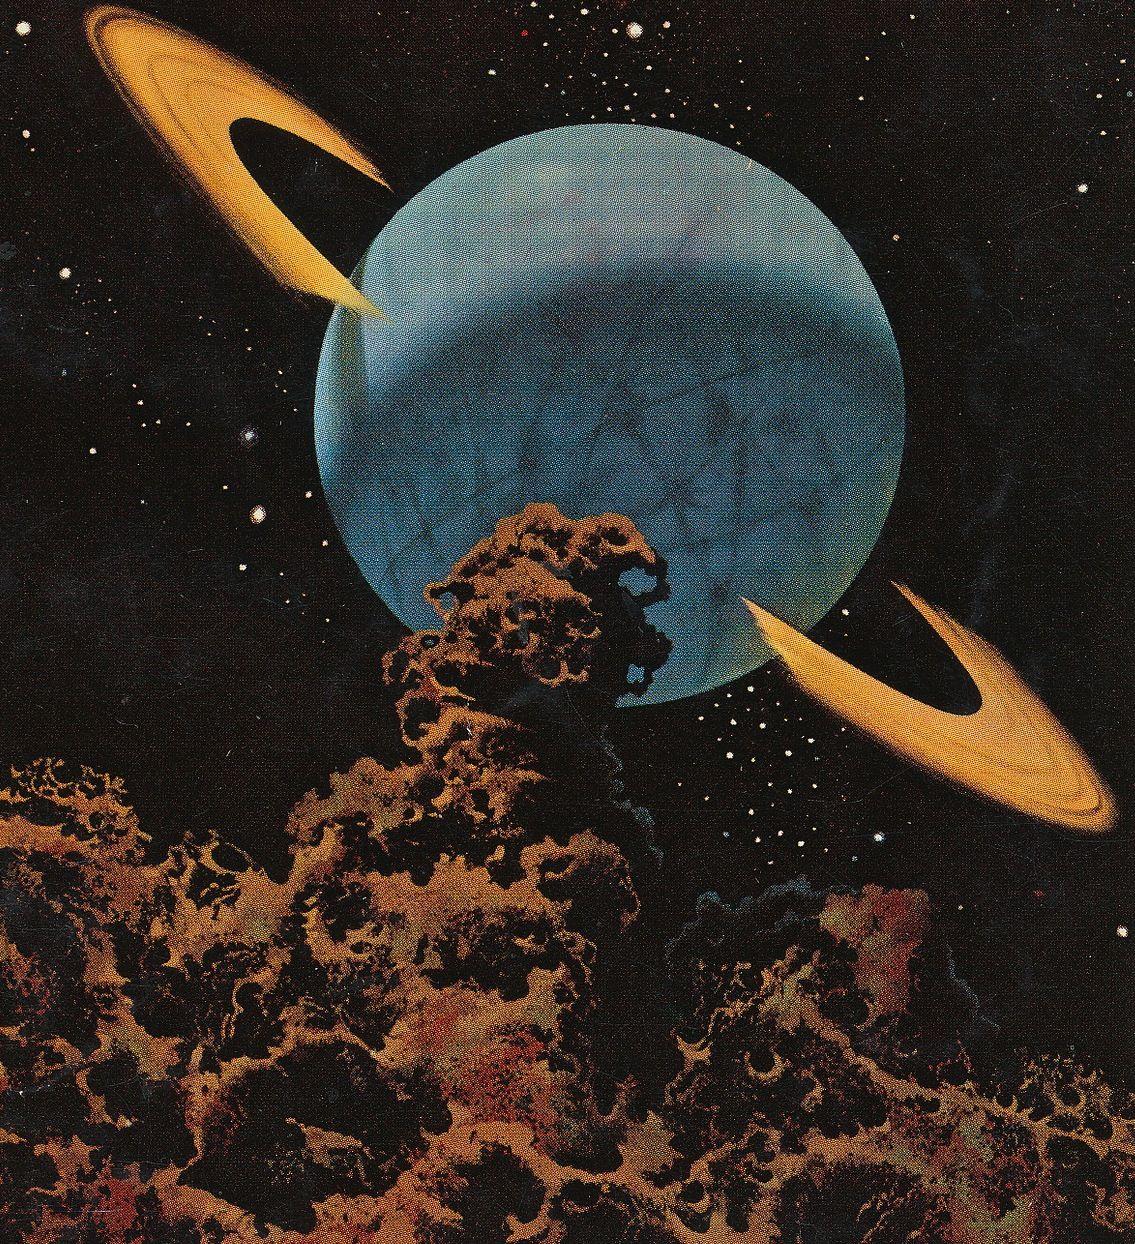 Retro Science Fiction Artwork Hd Space Art Science Fiction Art Art